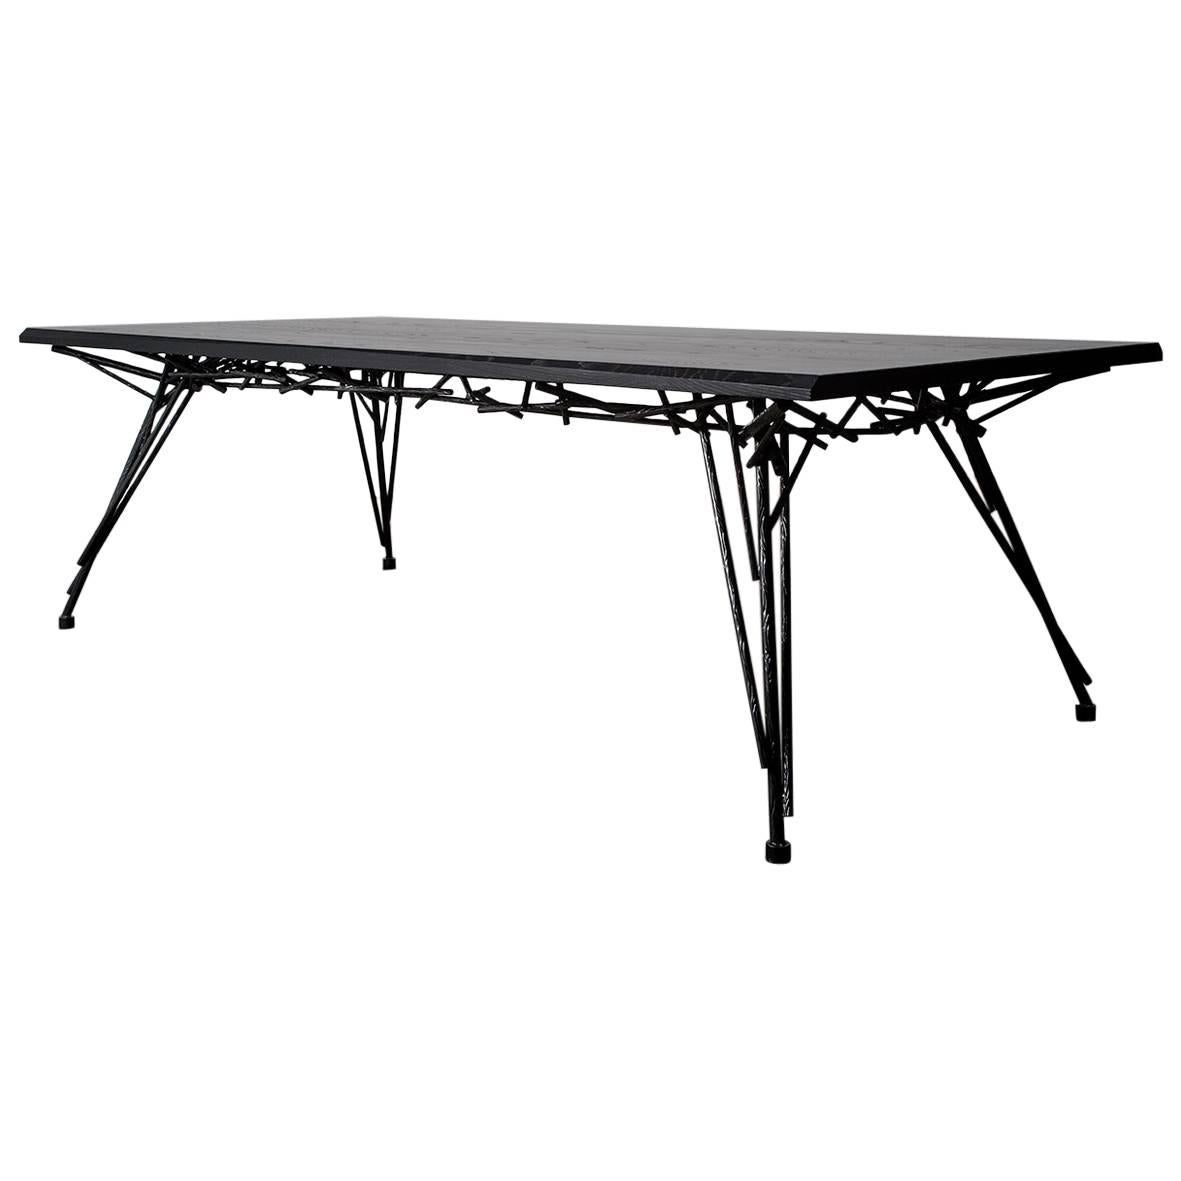 Table, Dining, Black, Ebonized Hardwood, Steel, Modern, Custom, Birdsnest Table